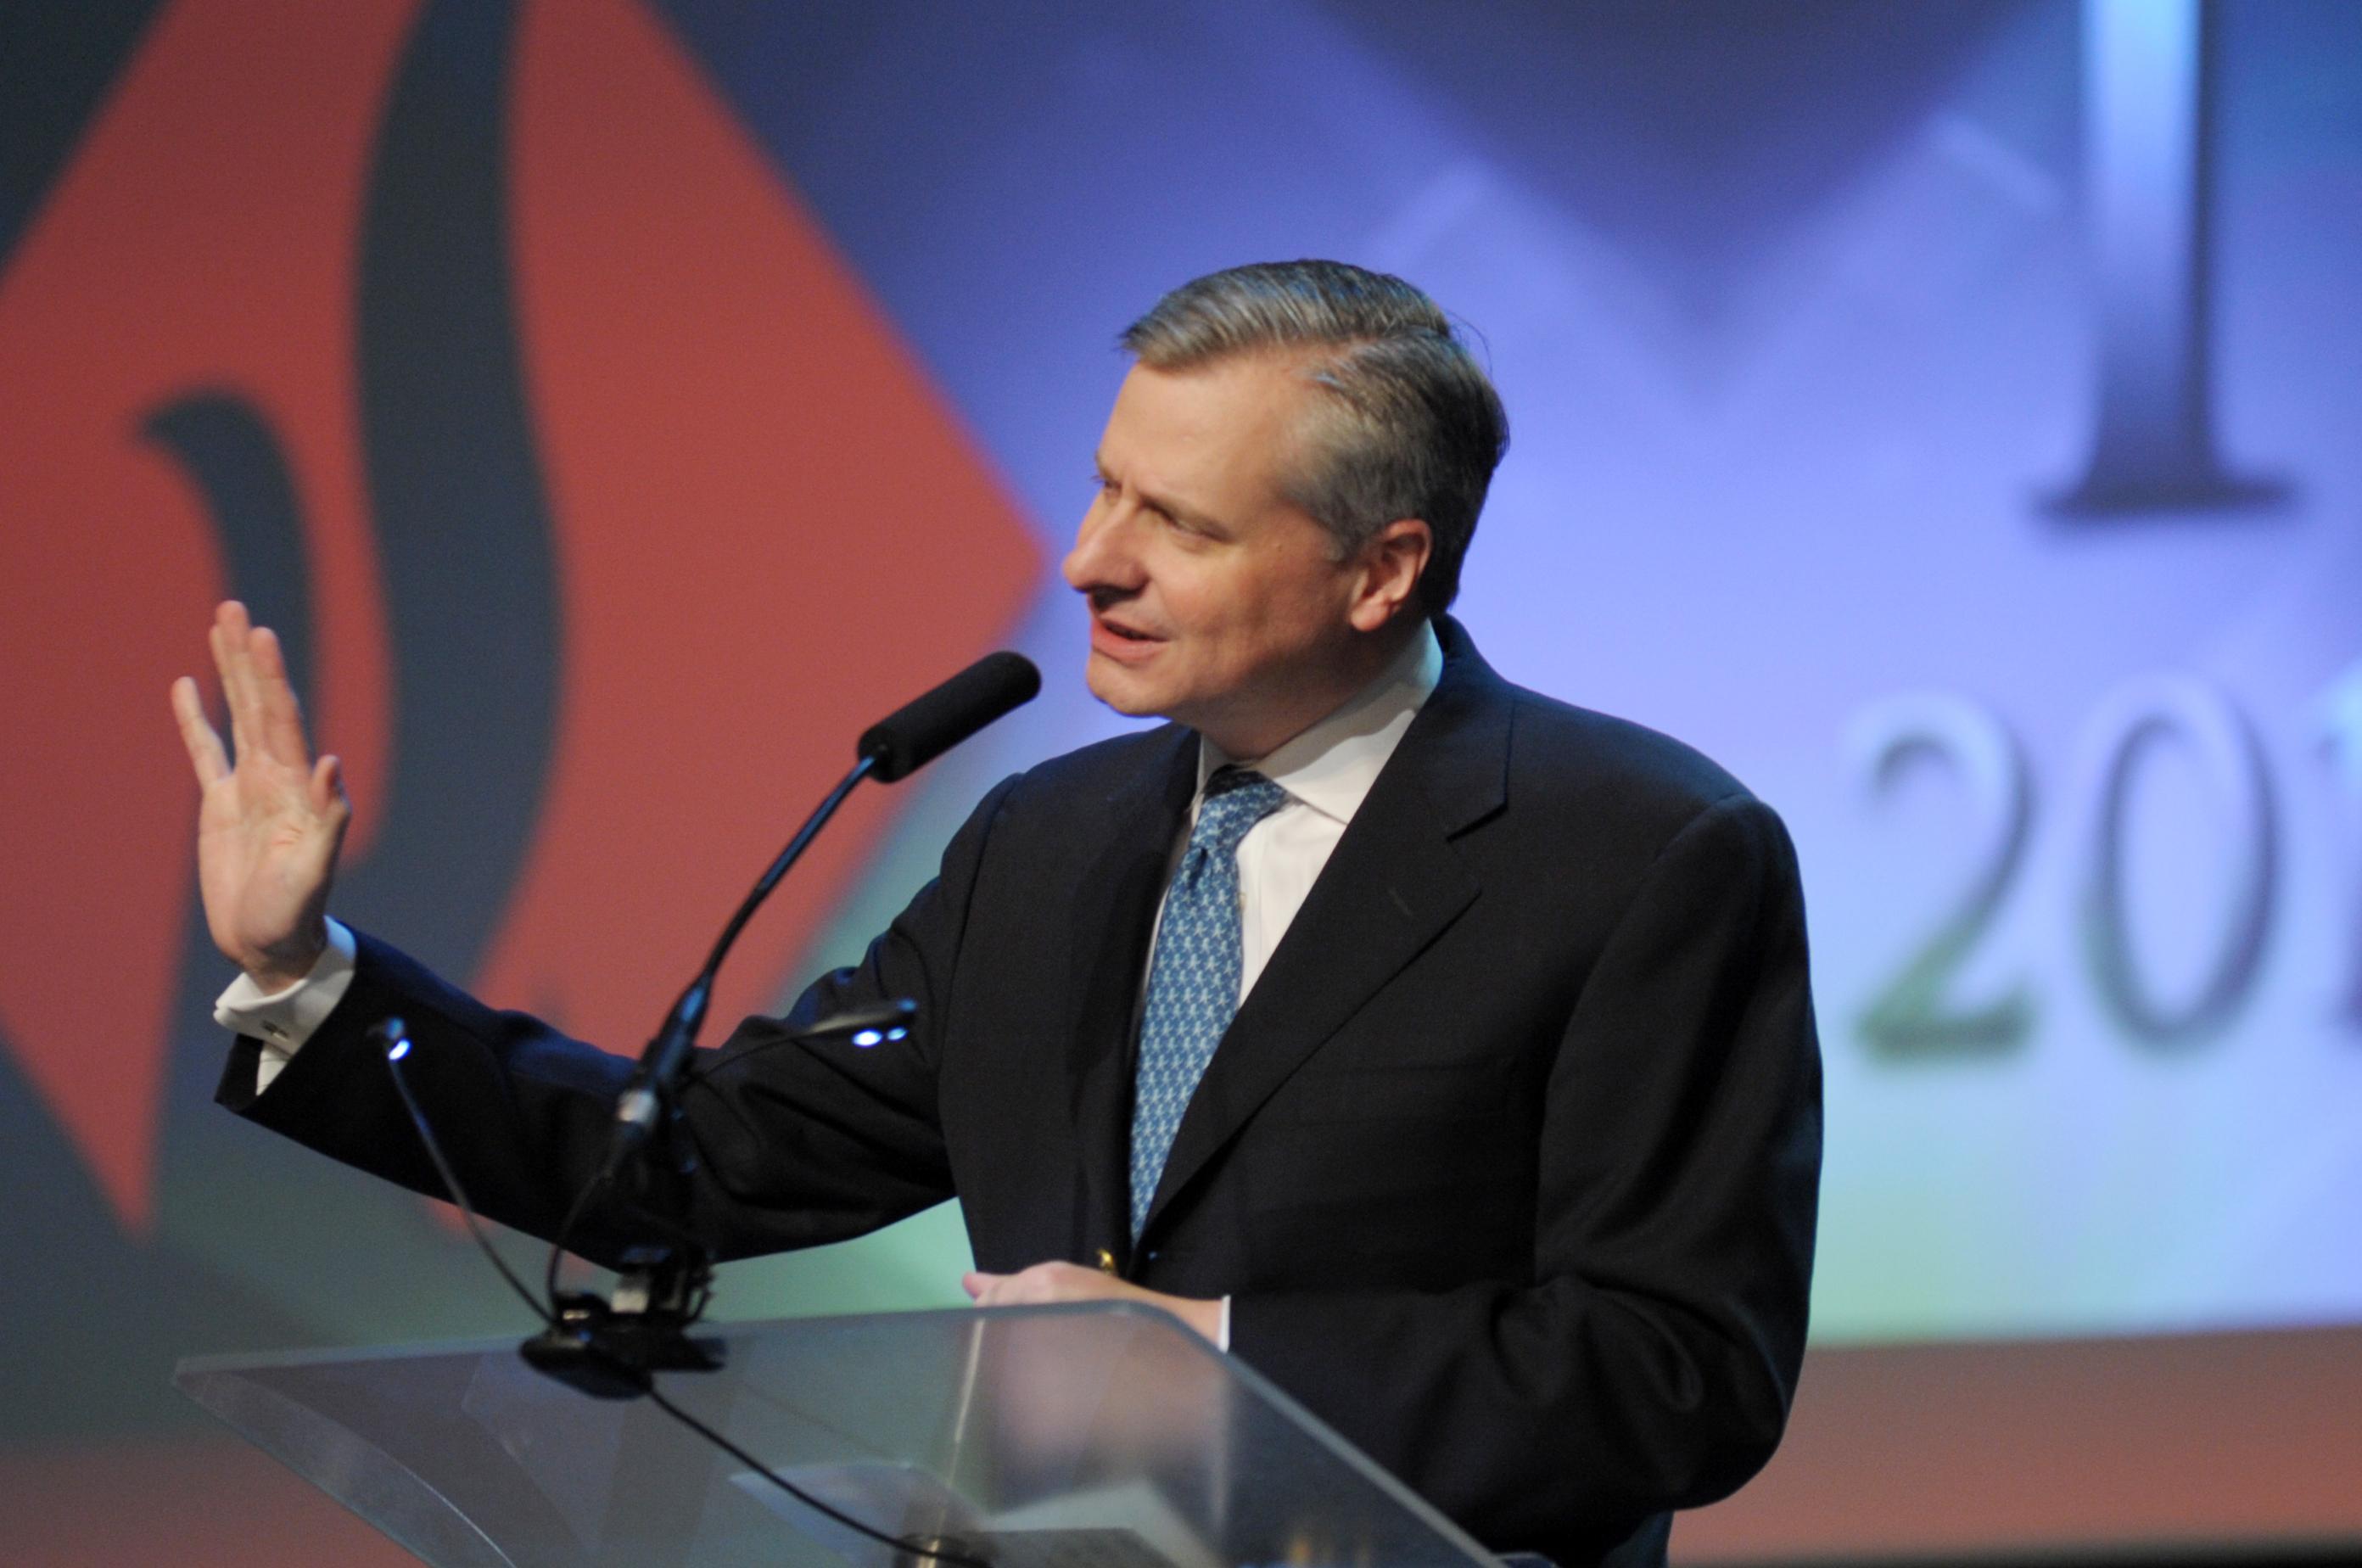 Pulitzer Prize winner Jon Meacham to deliver 23rd annual Governor's Lecture